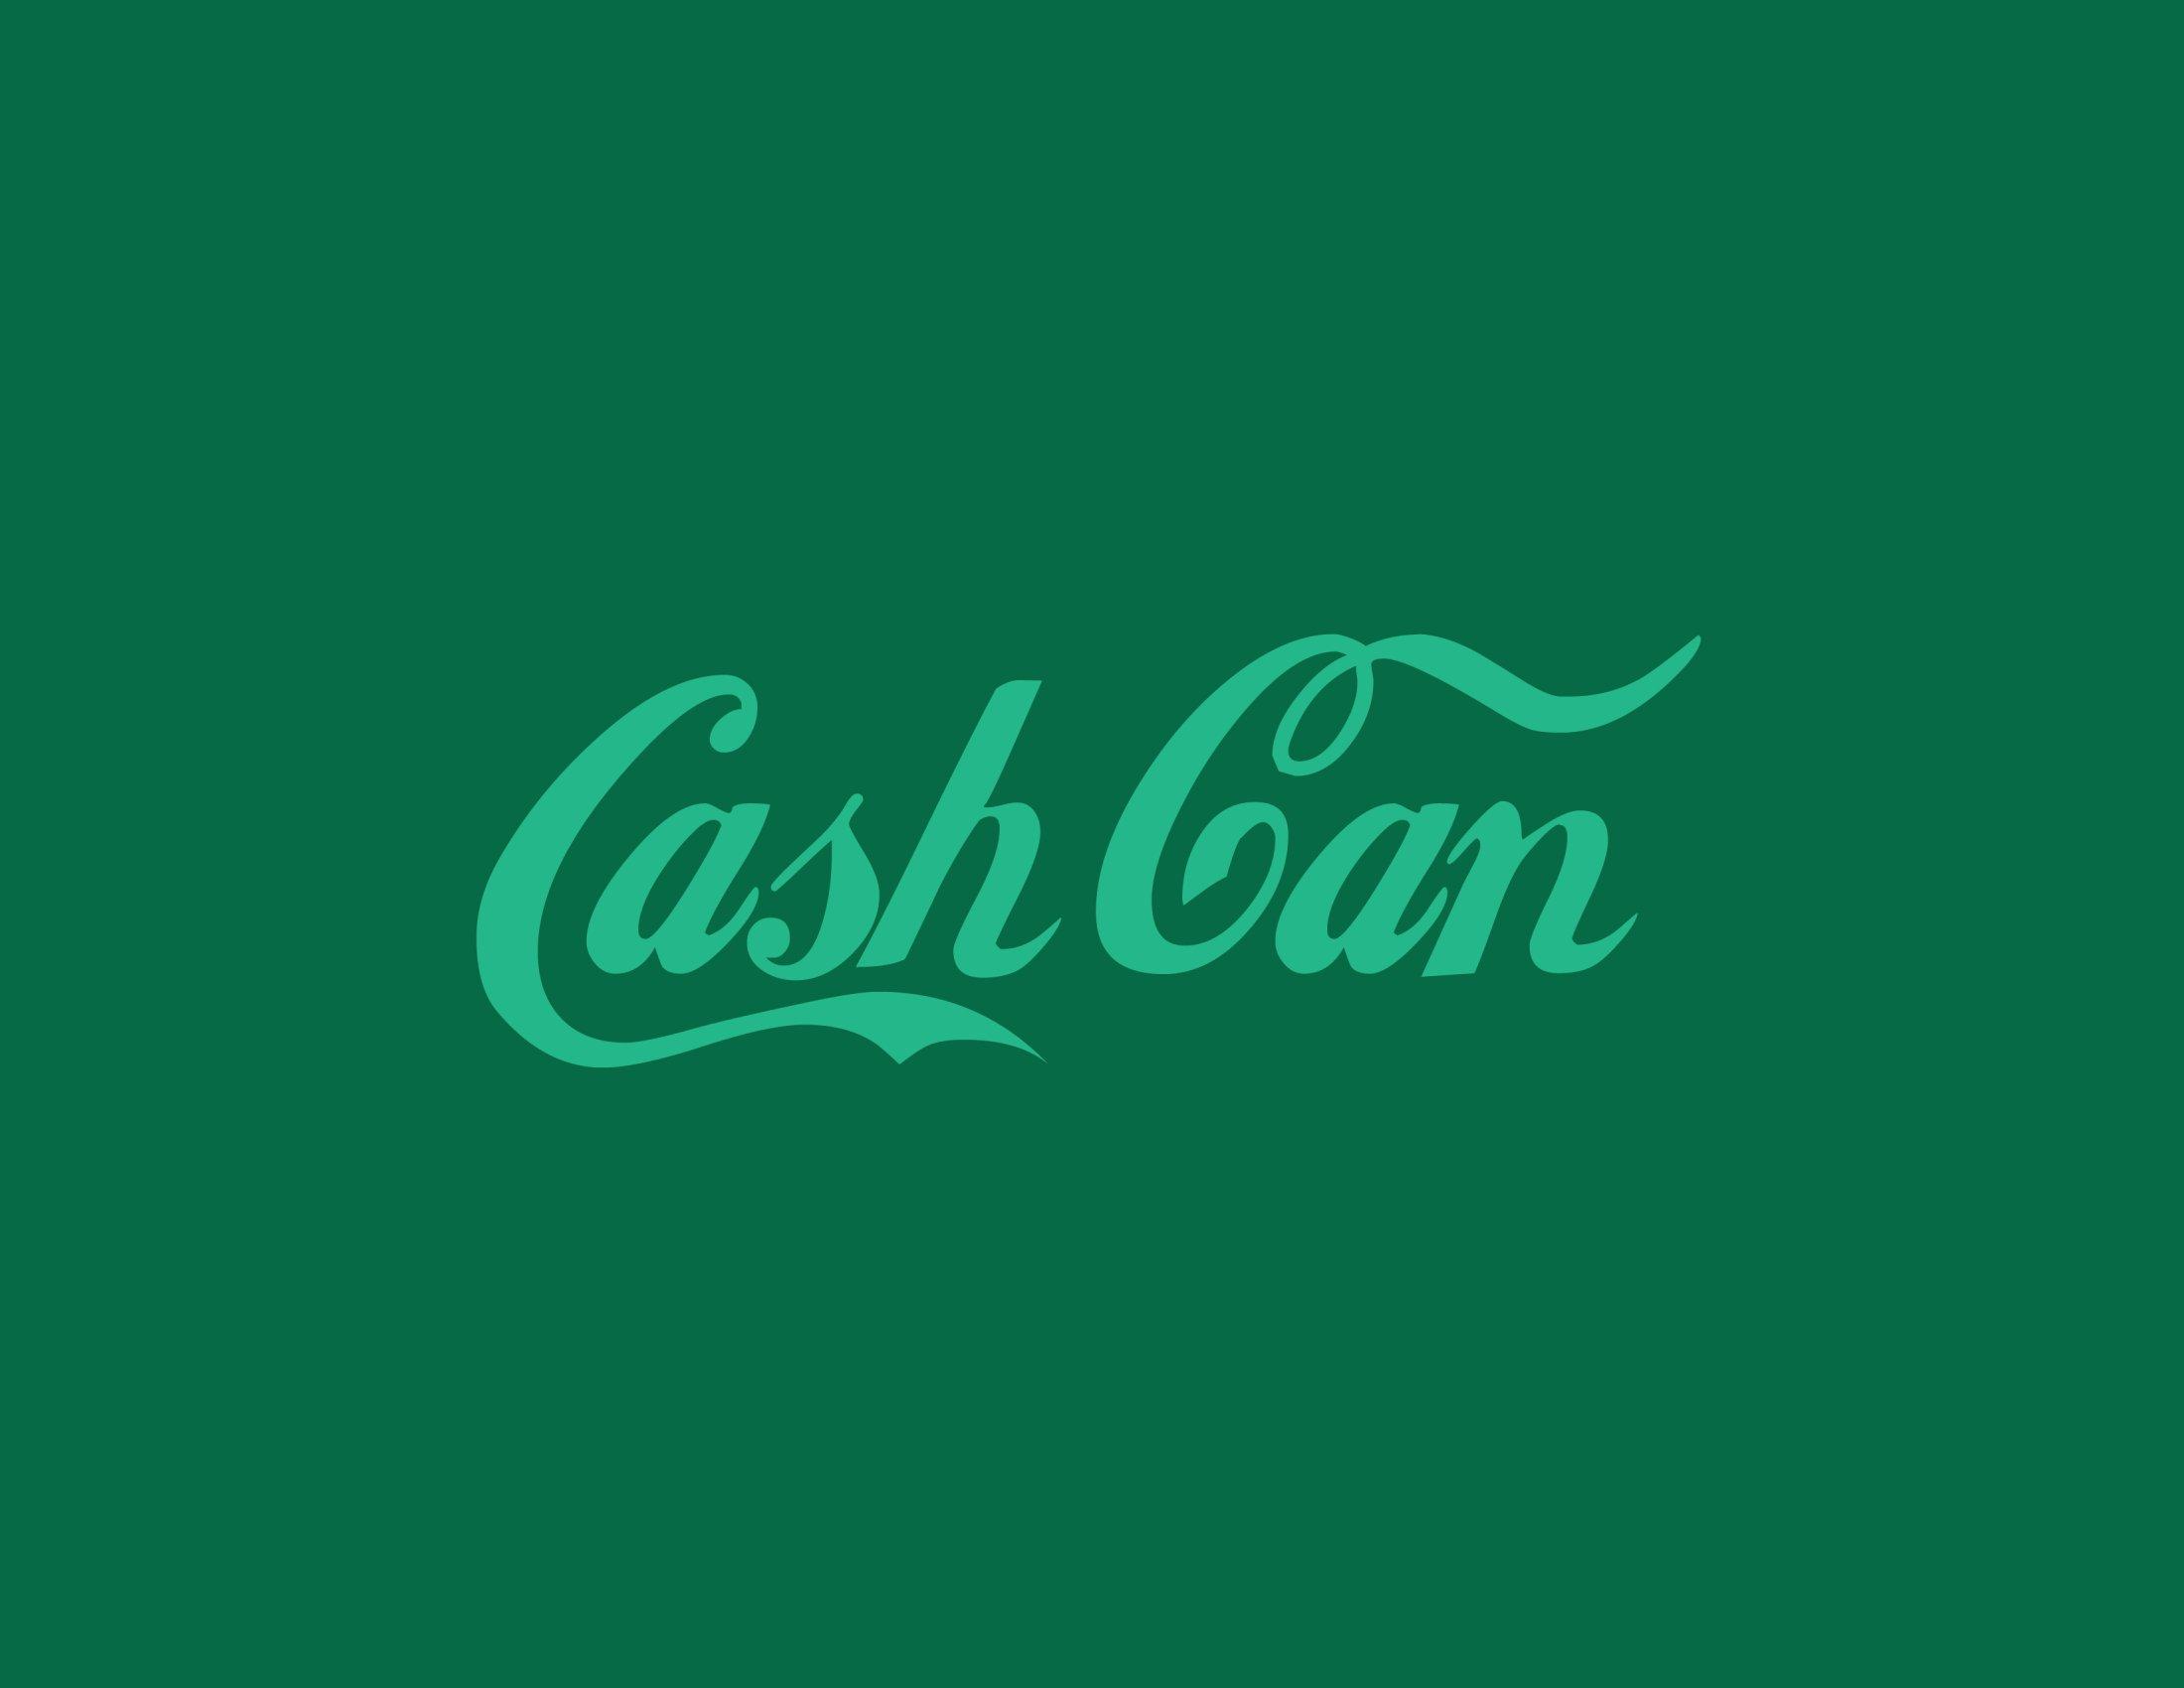 Thumbnail for CashCan